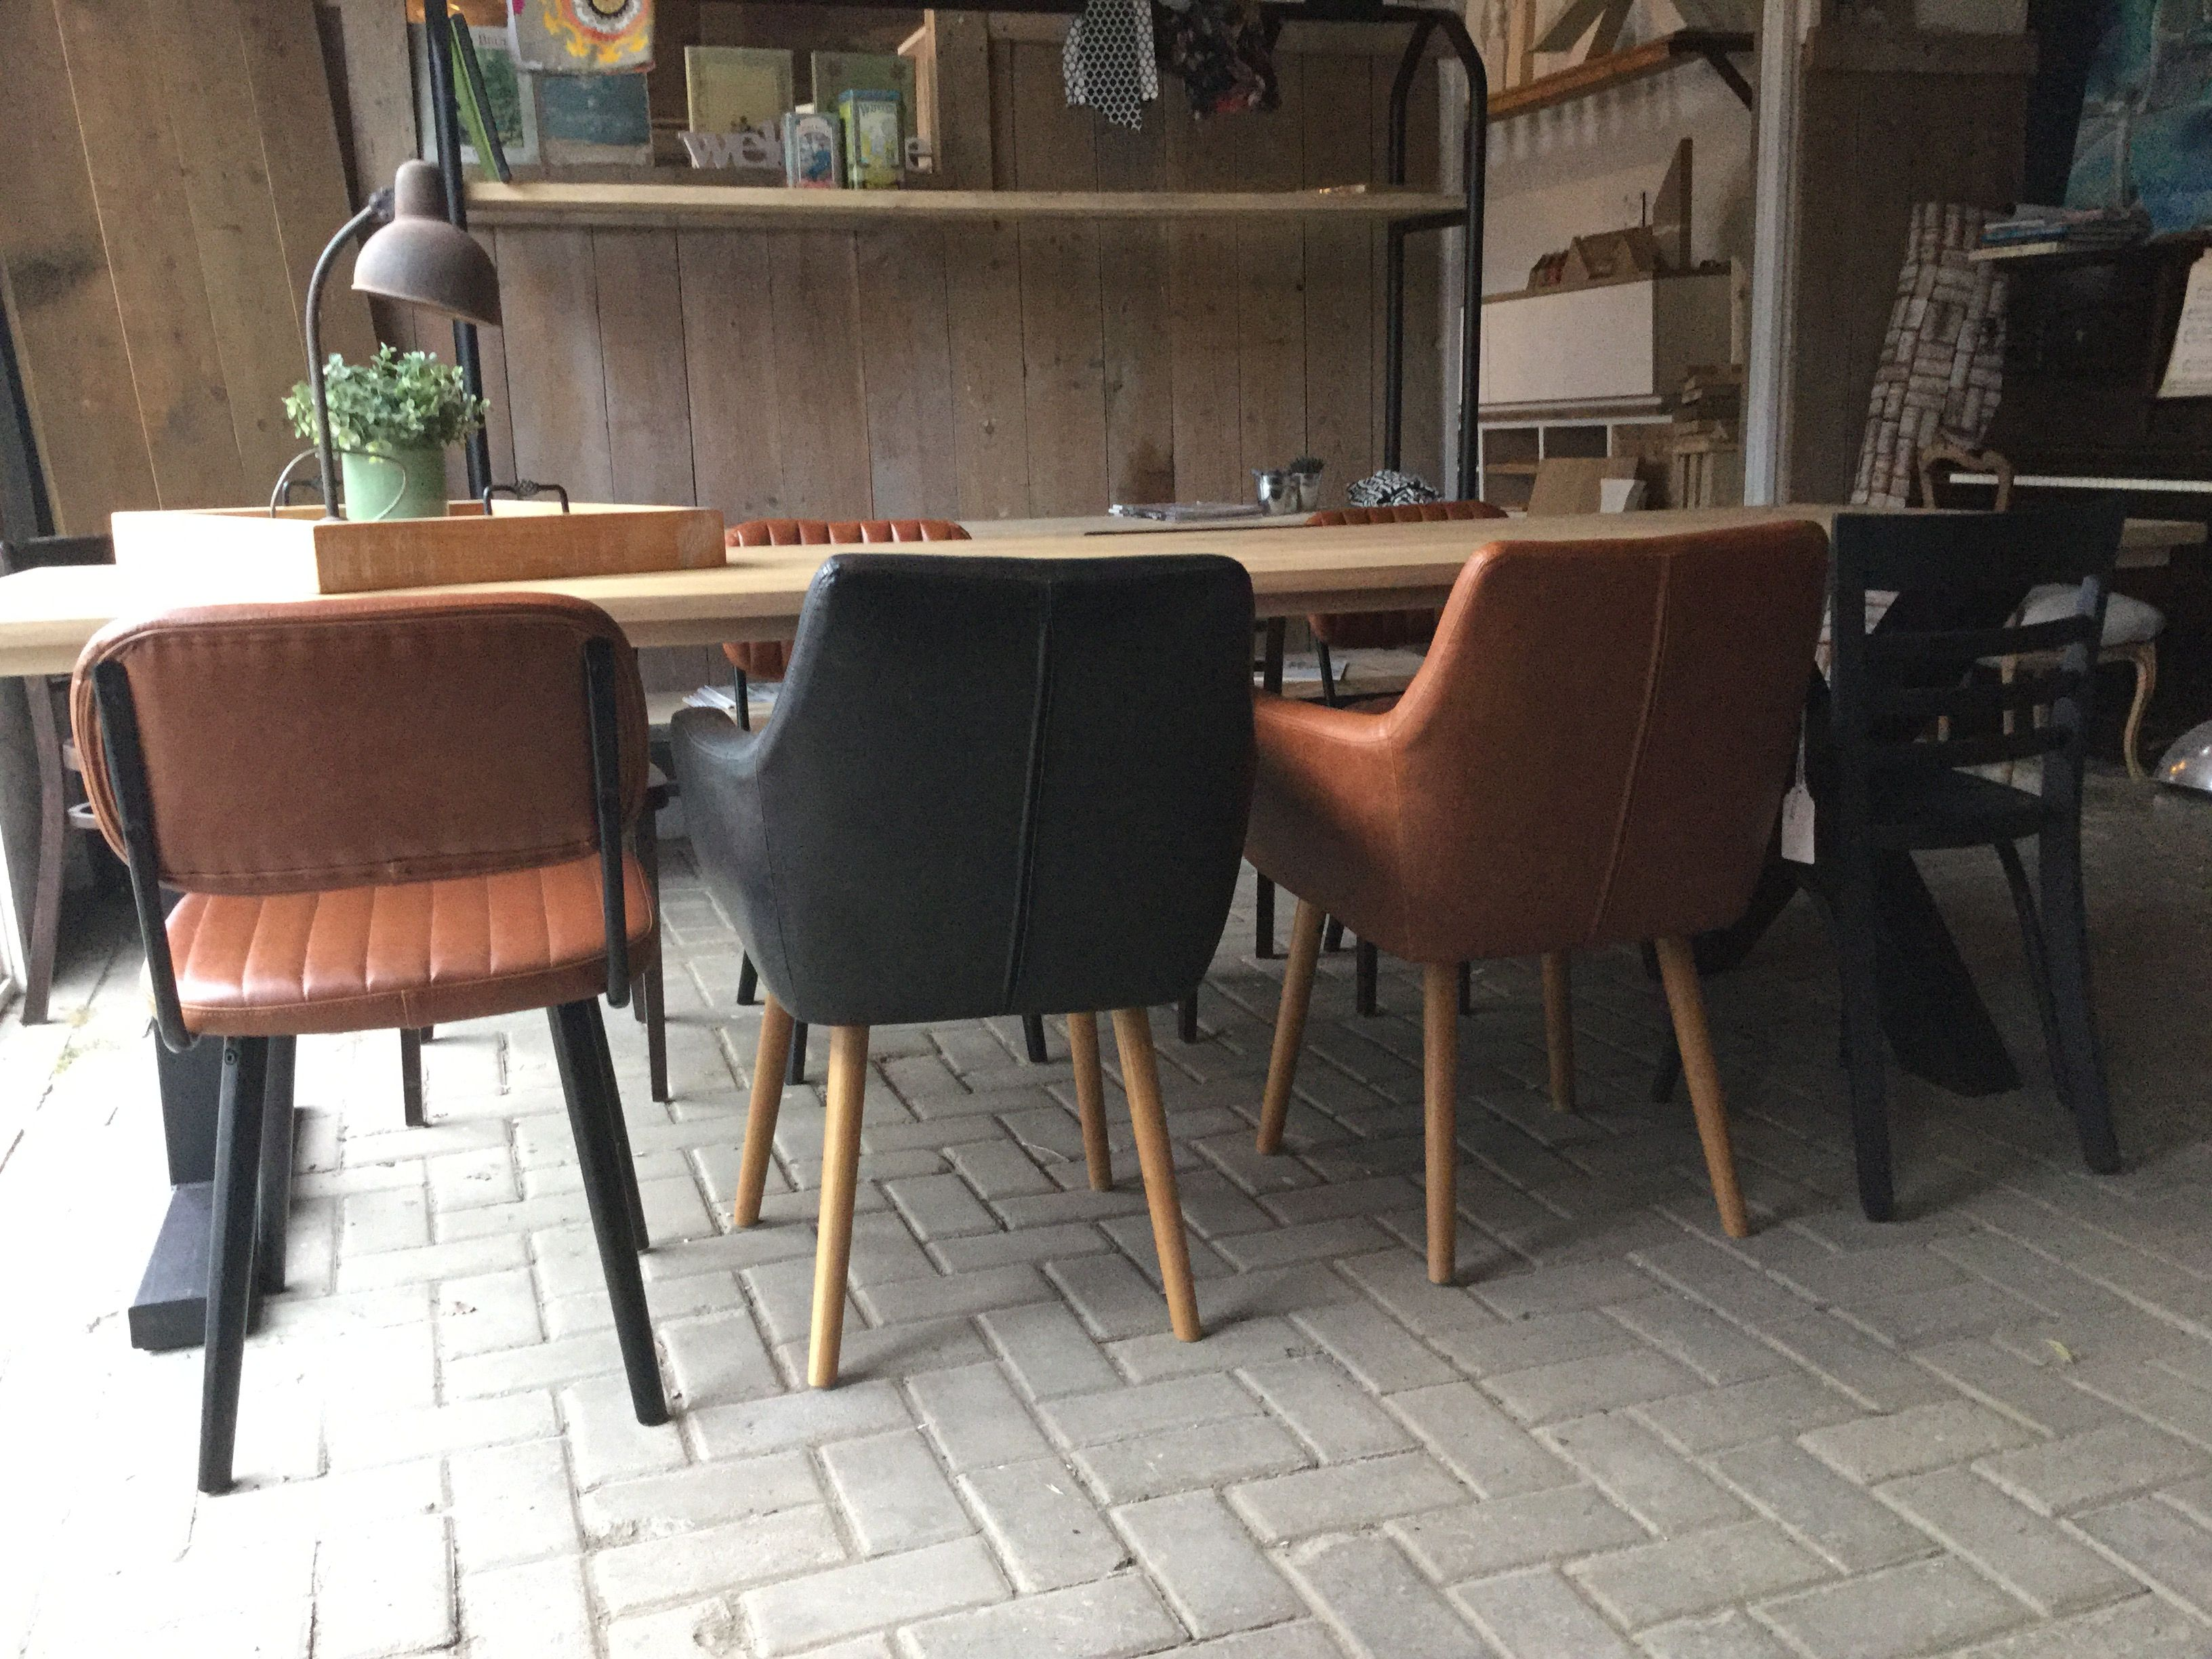 Stoer Industriele Eetkamerstoelen : Mix en match de industriële stoelen melbourne en sydney. leverbaar